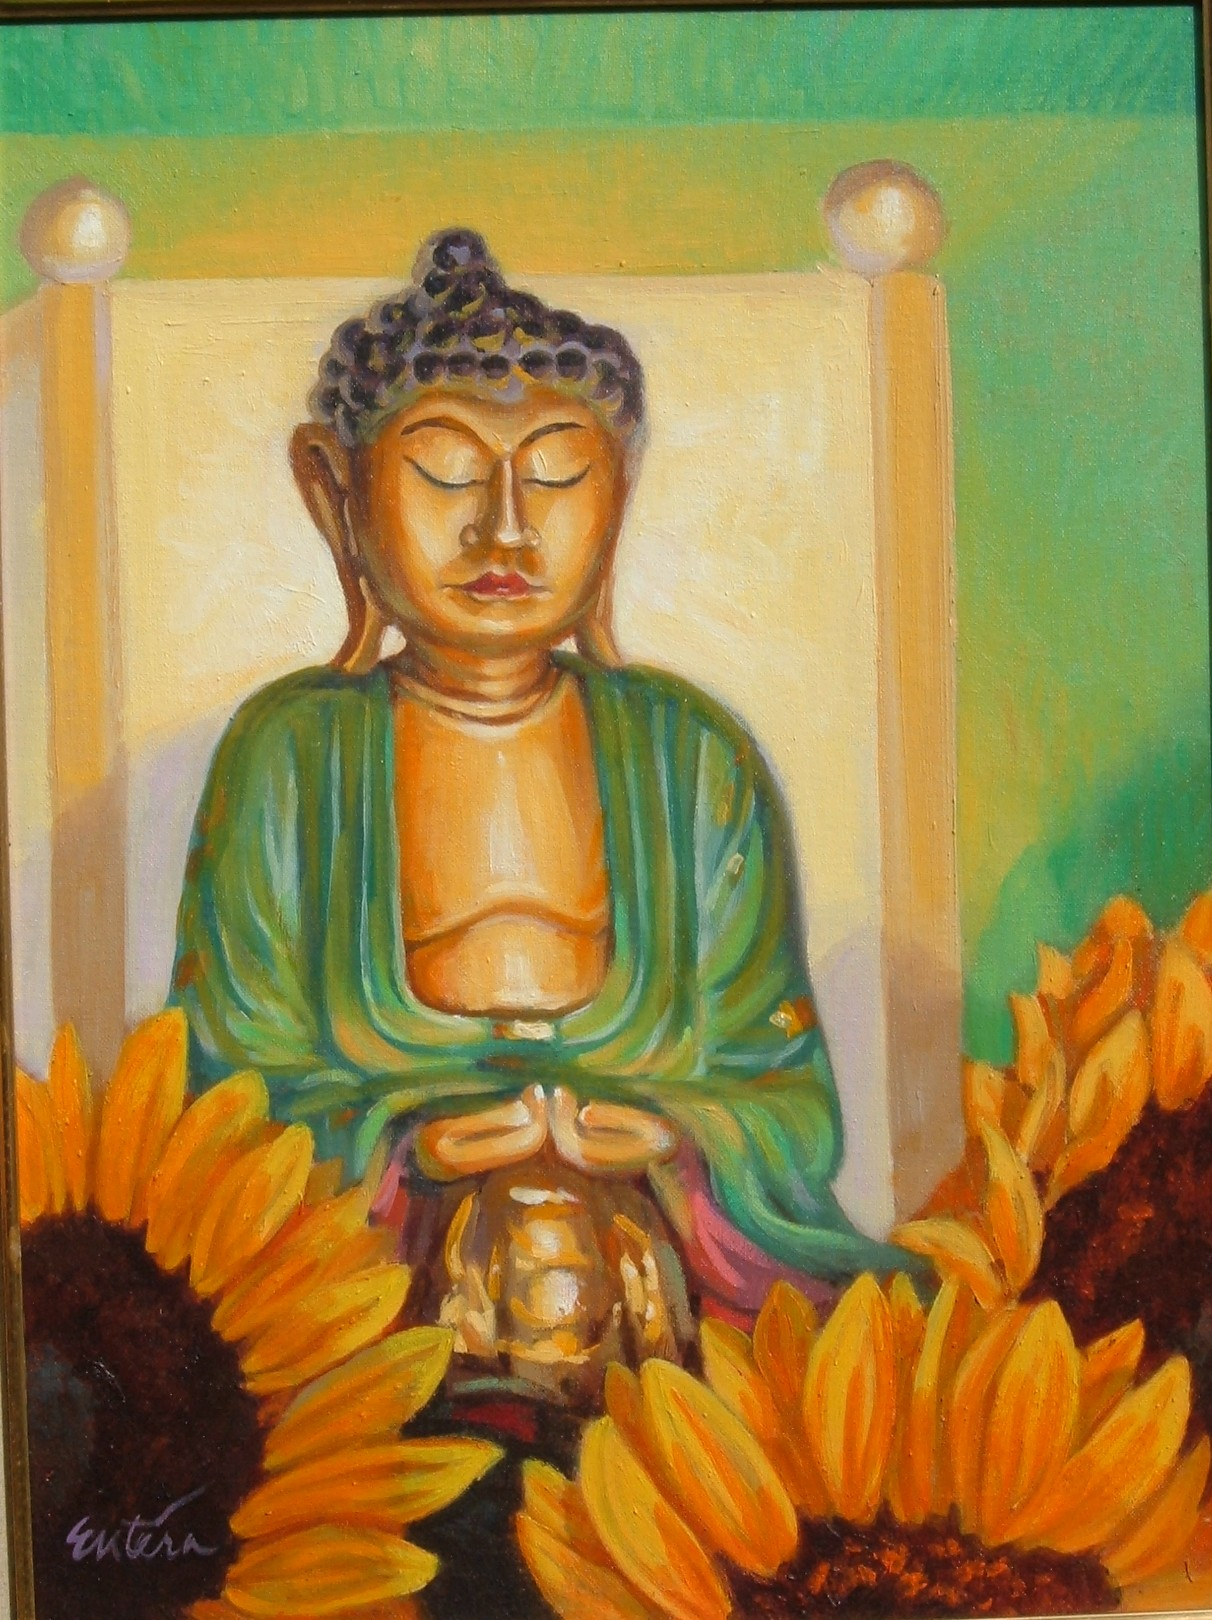 sunflower_buddha_001.jpg